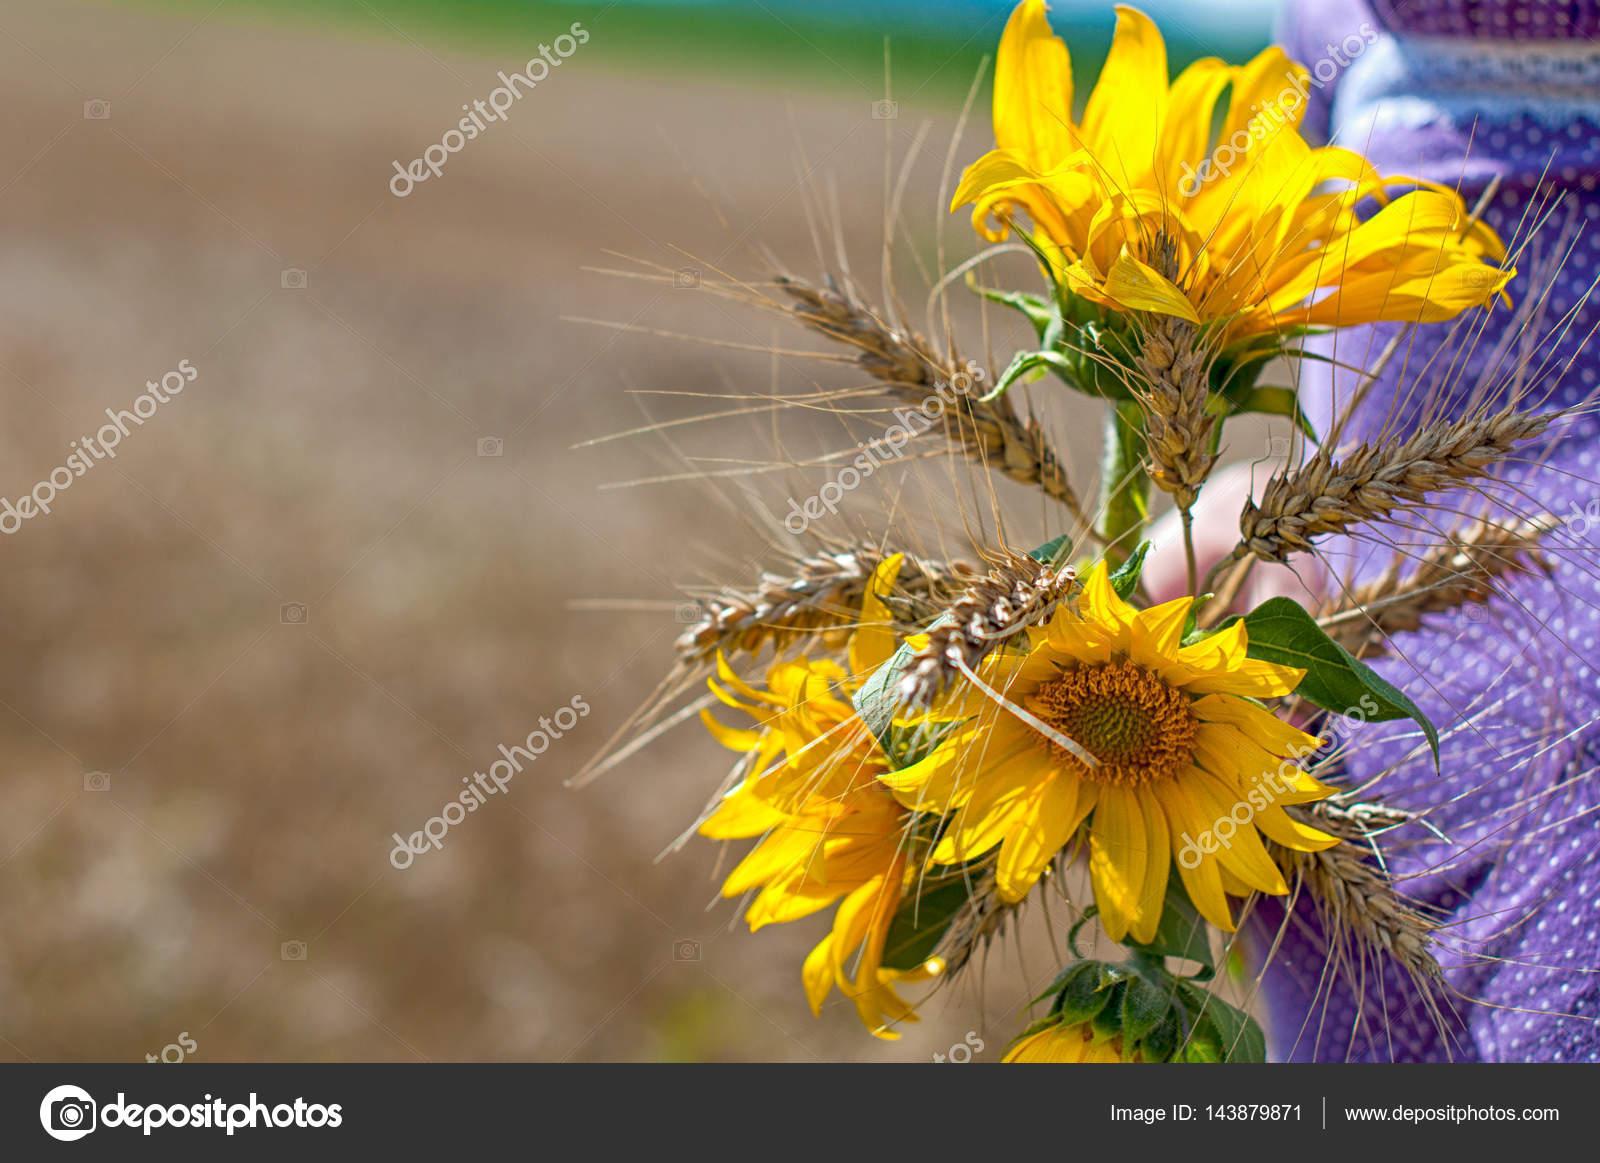 bouquet de tournesol (helianthus annuus) — photographie iosifbudau